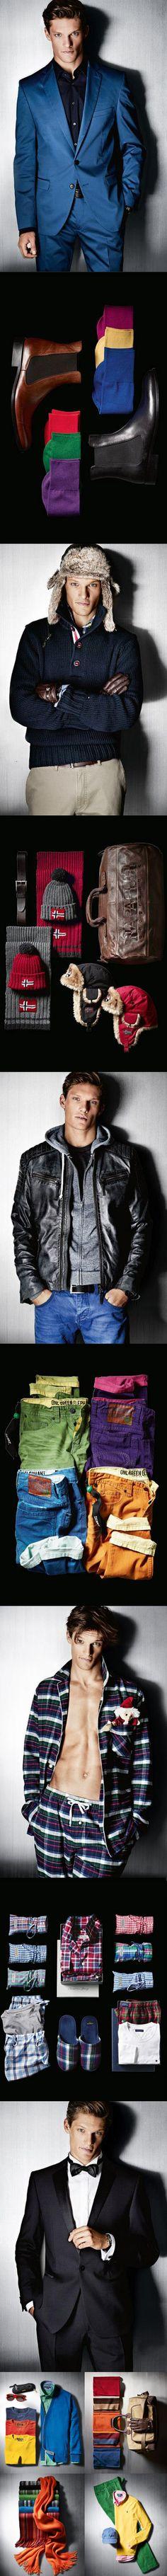 5d67f502f815 219 Best Manchild Wear images in 2012 | Man fashion, Man style, Male ...